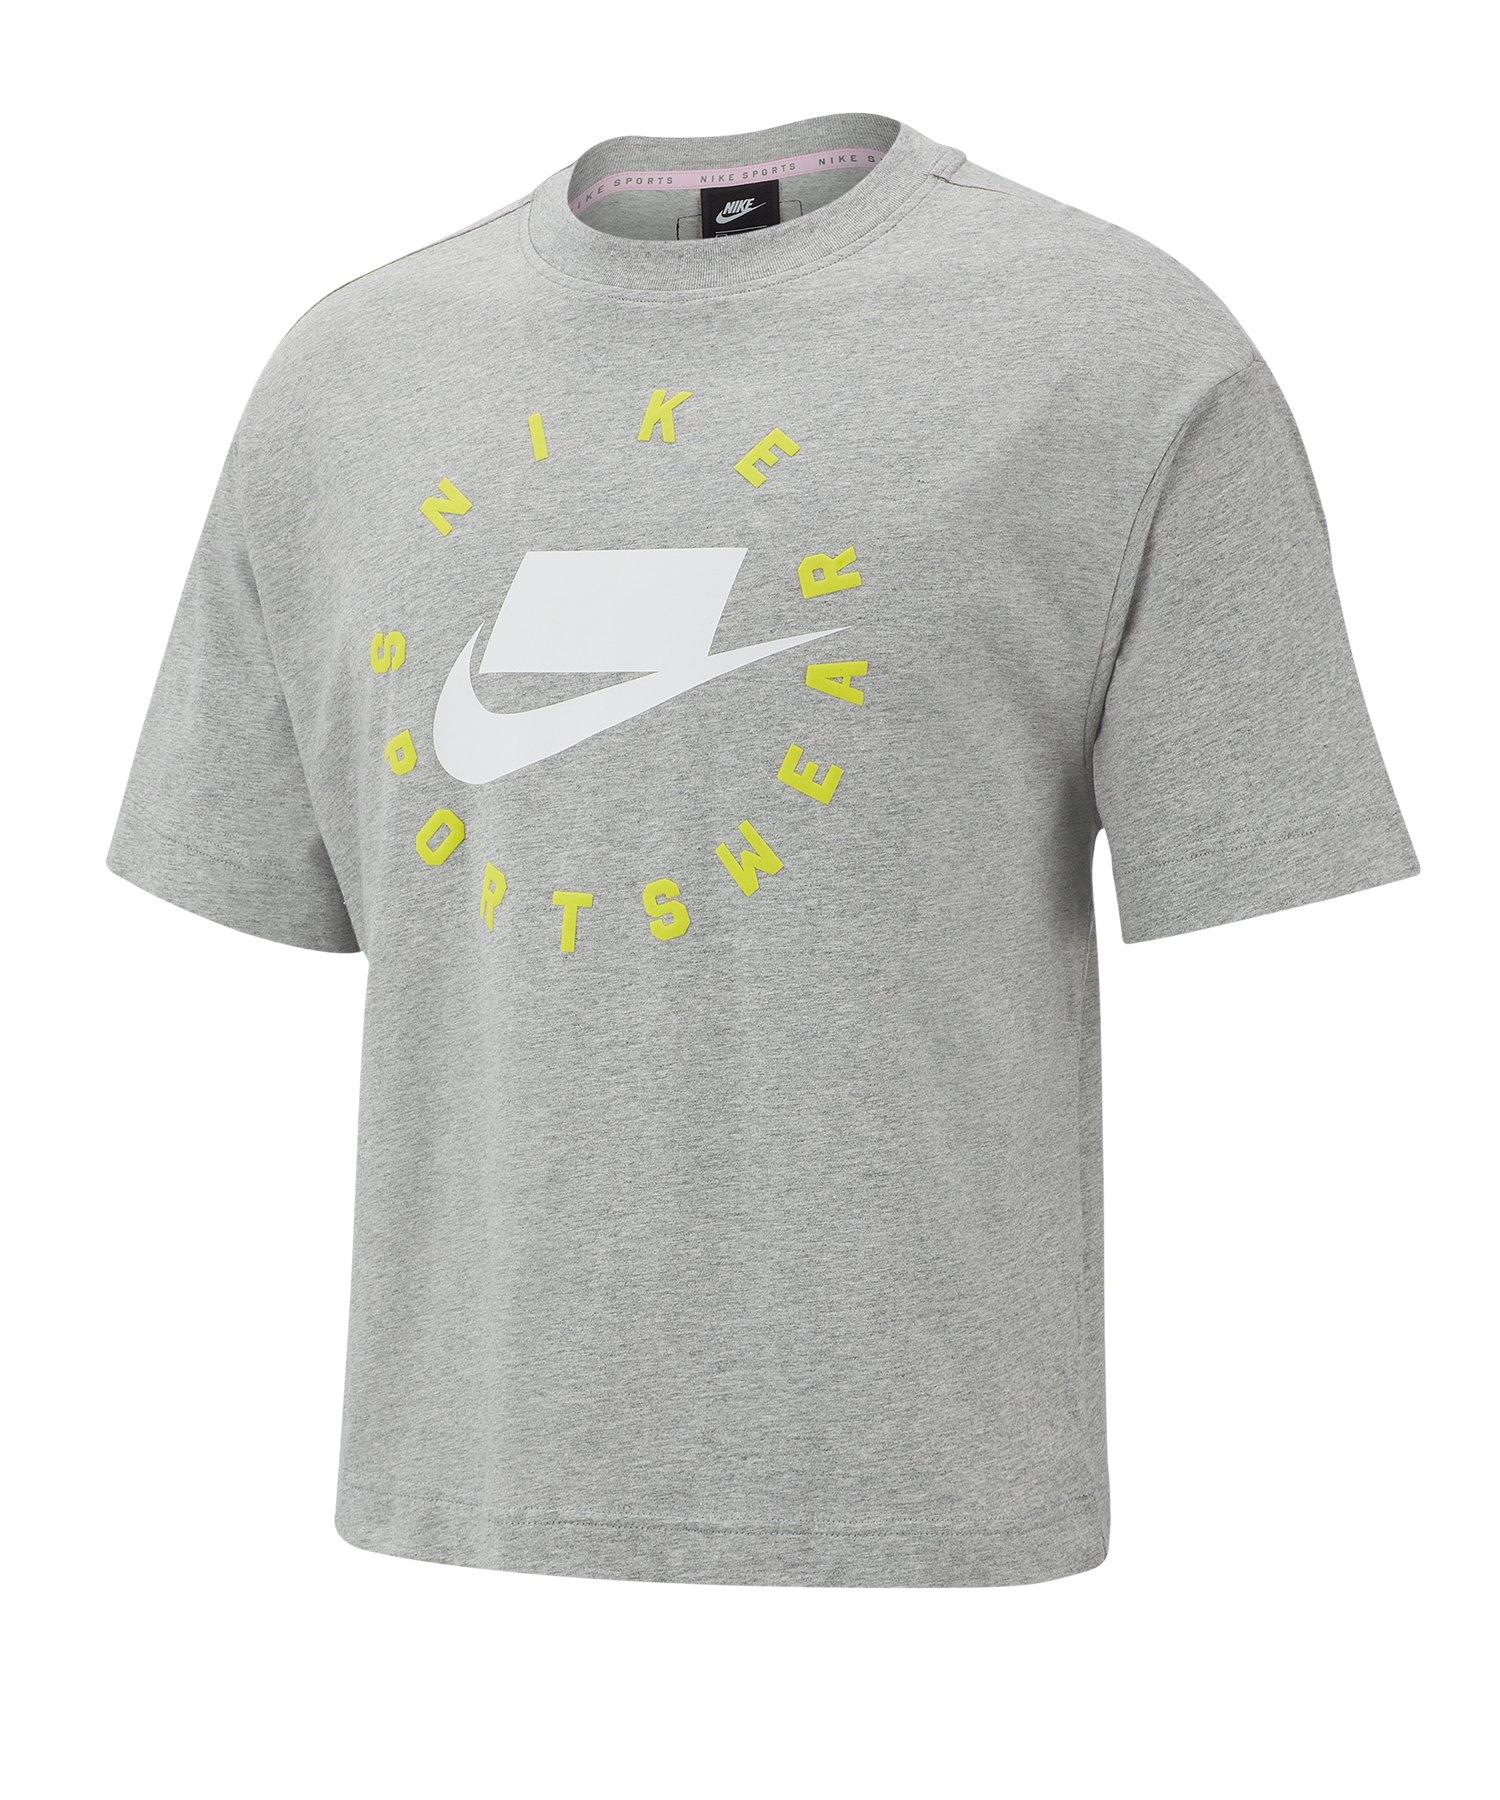 Nike Tee T-Shirt Damen Grau F063 - grau